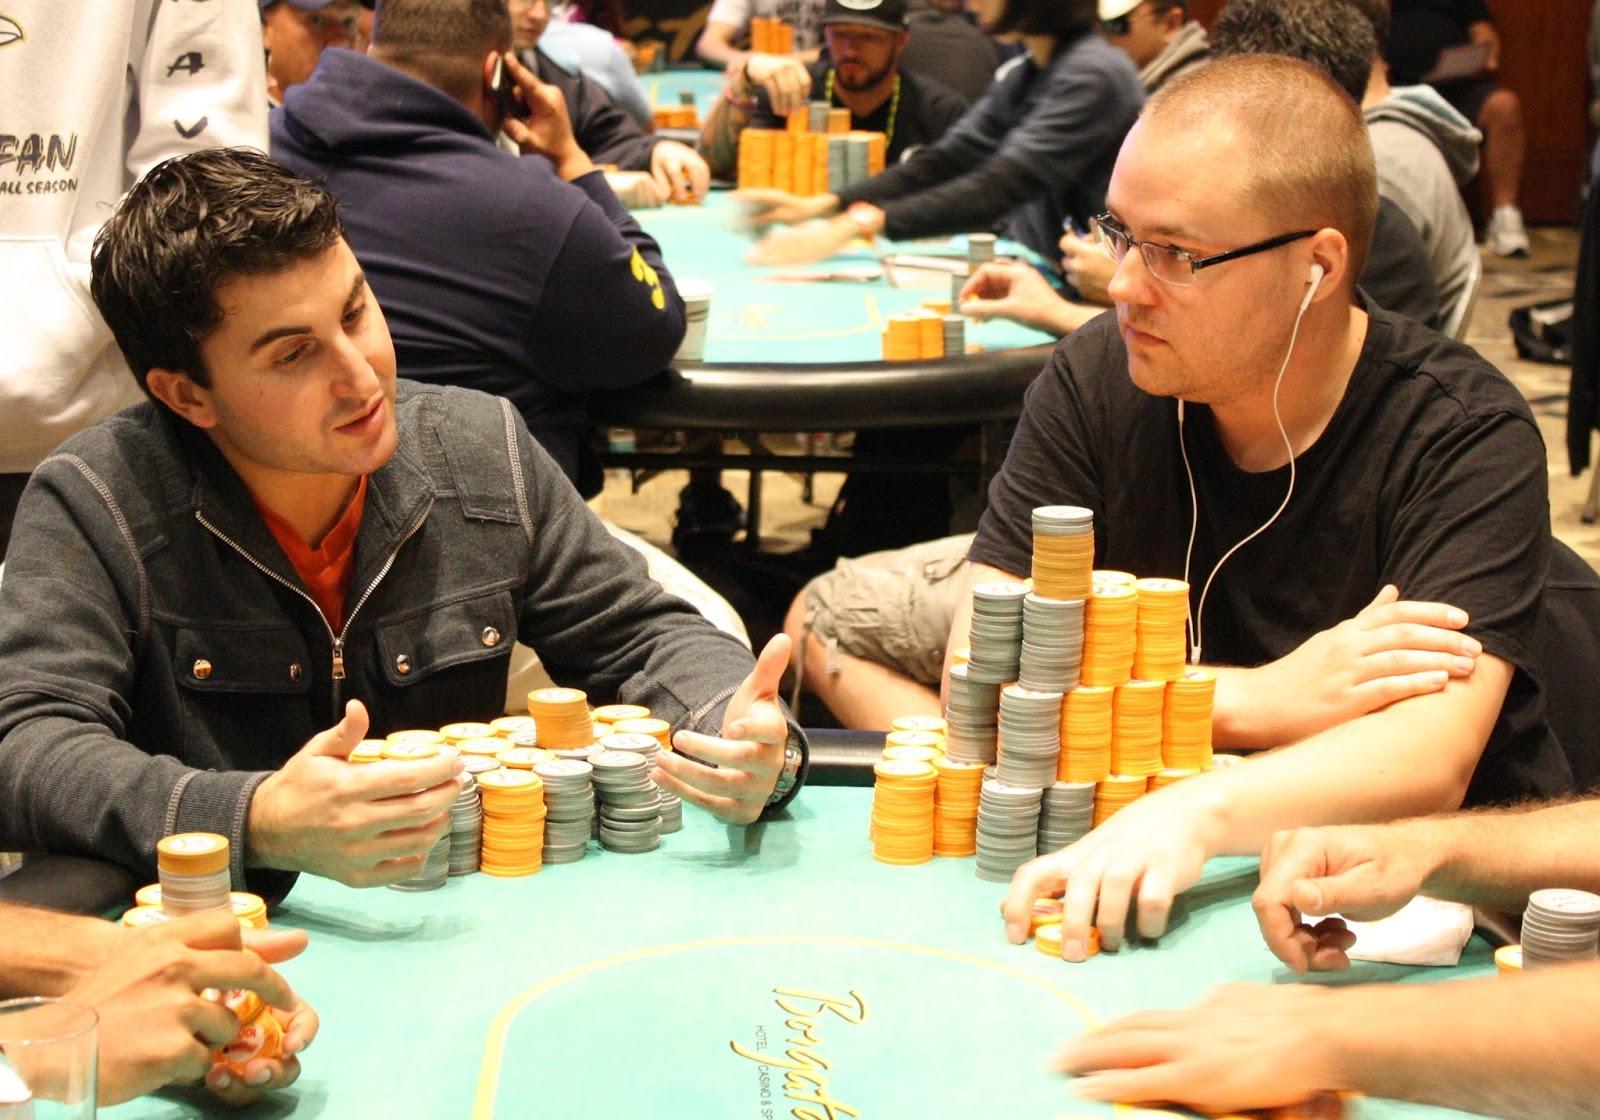 Event 2 (Day 1) Archives - Borgata Poker Open Blog